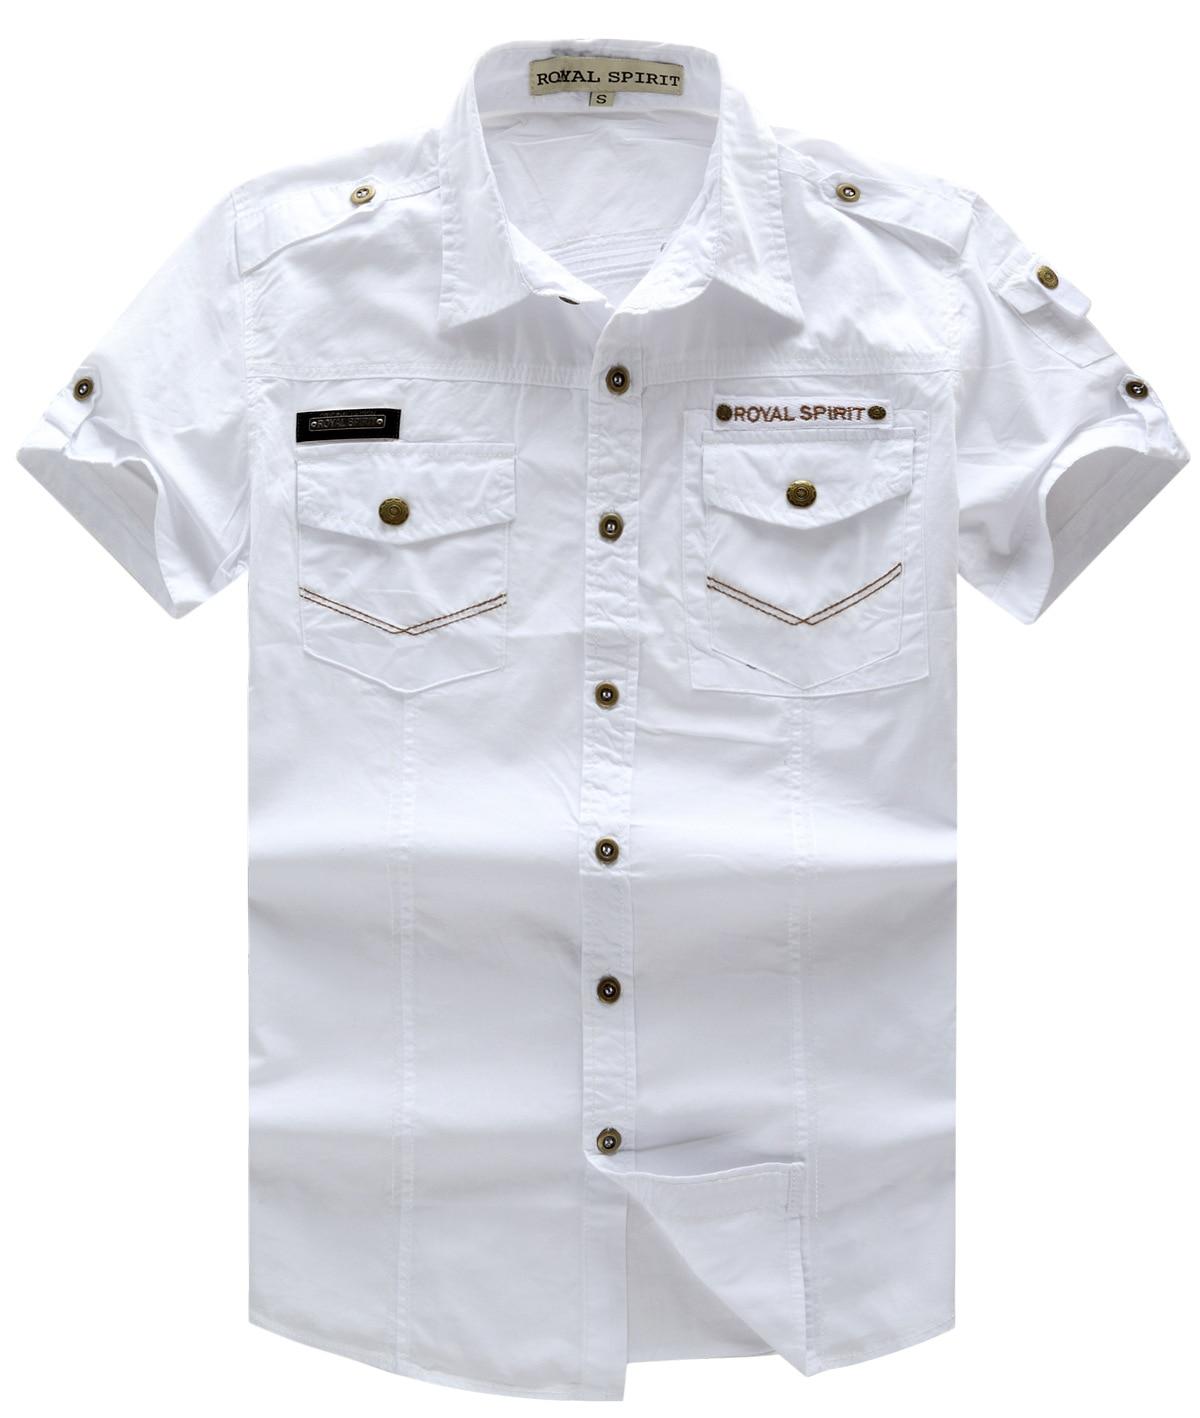 Fredd Marshall Men 39 S Dress Shirt Casual Brand Short Sleeve